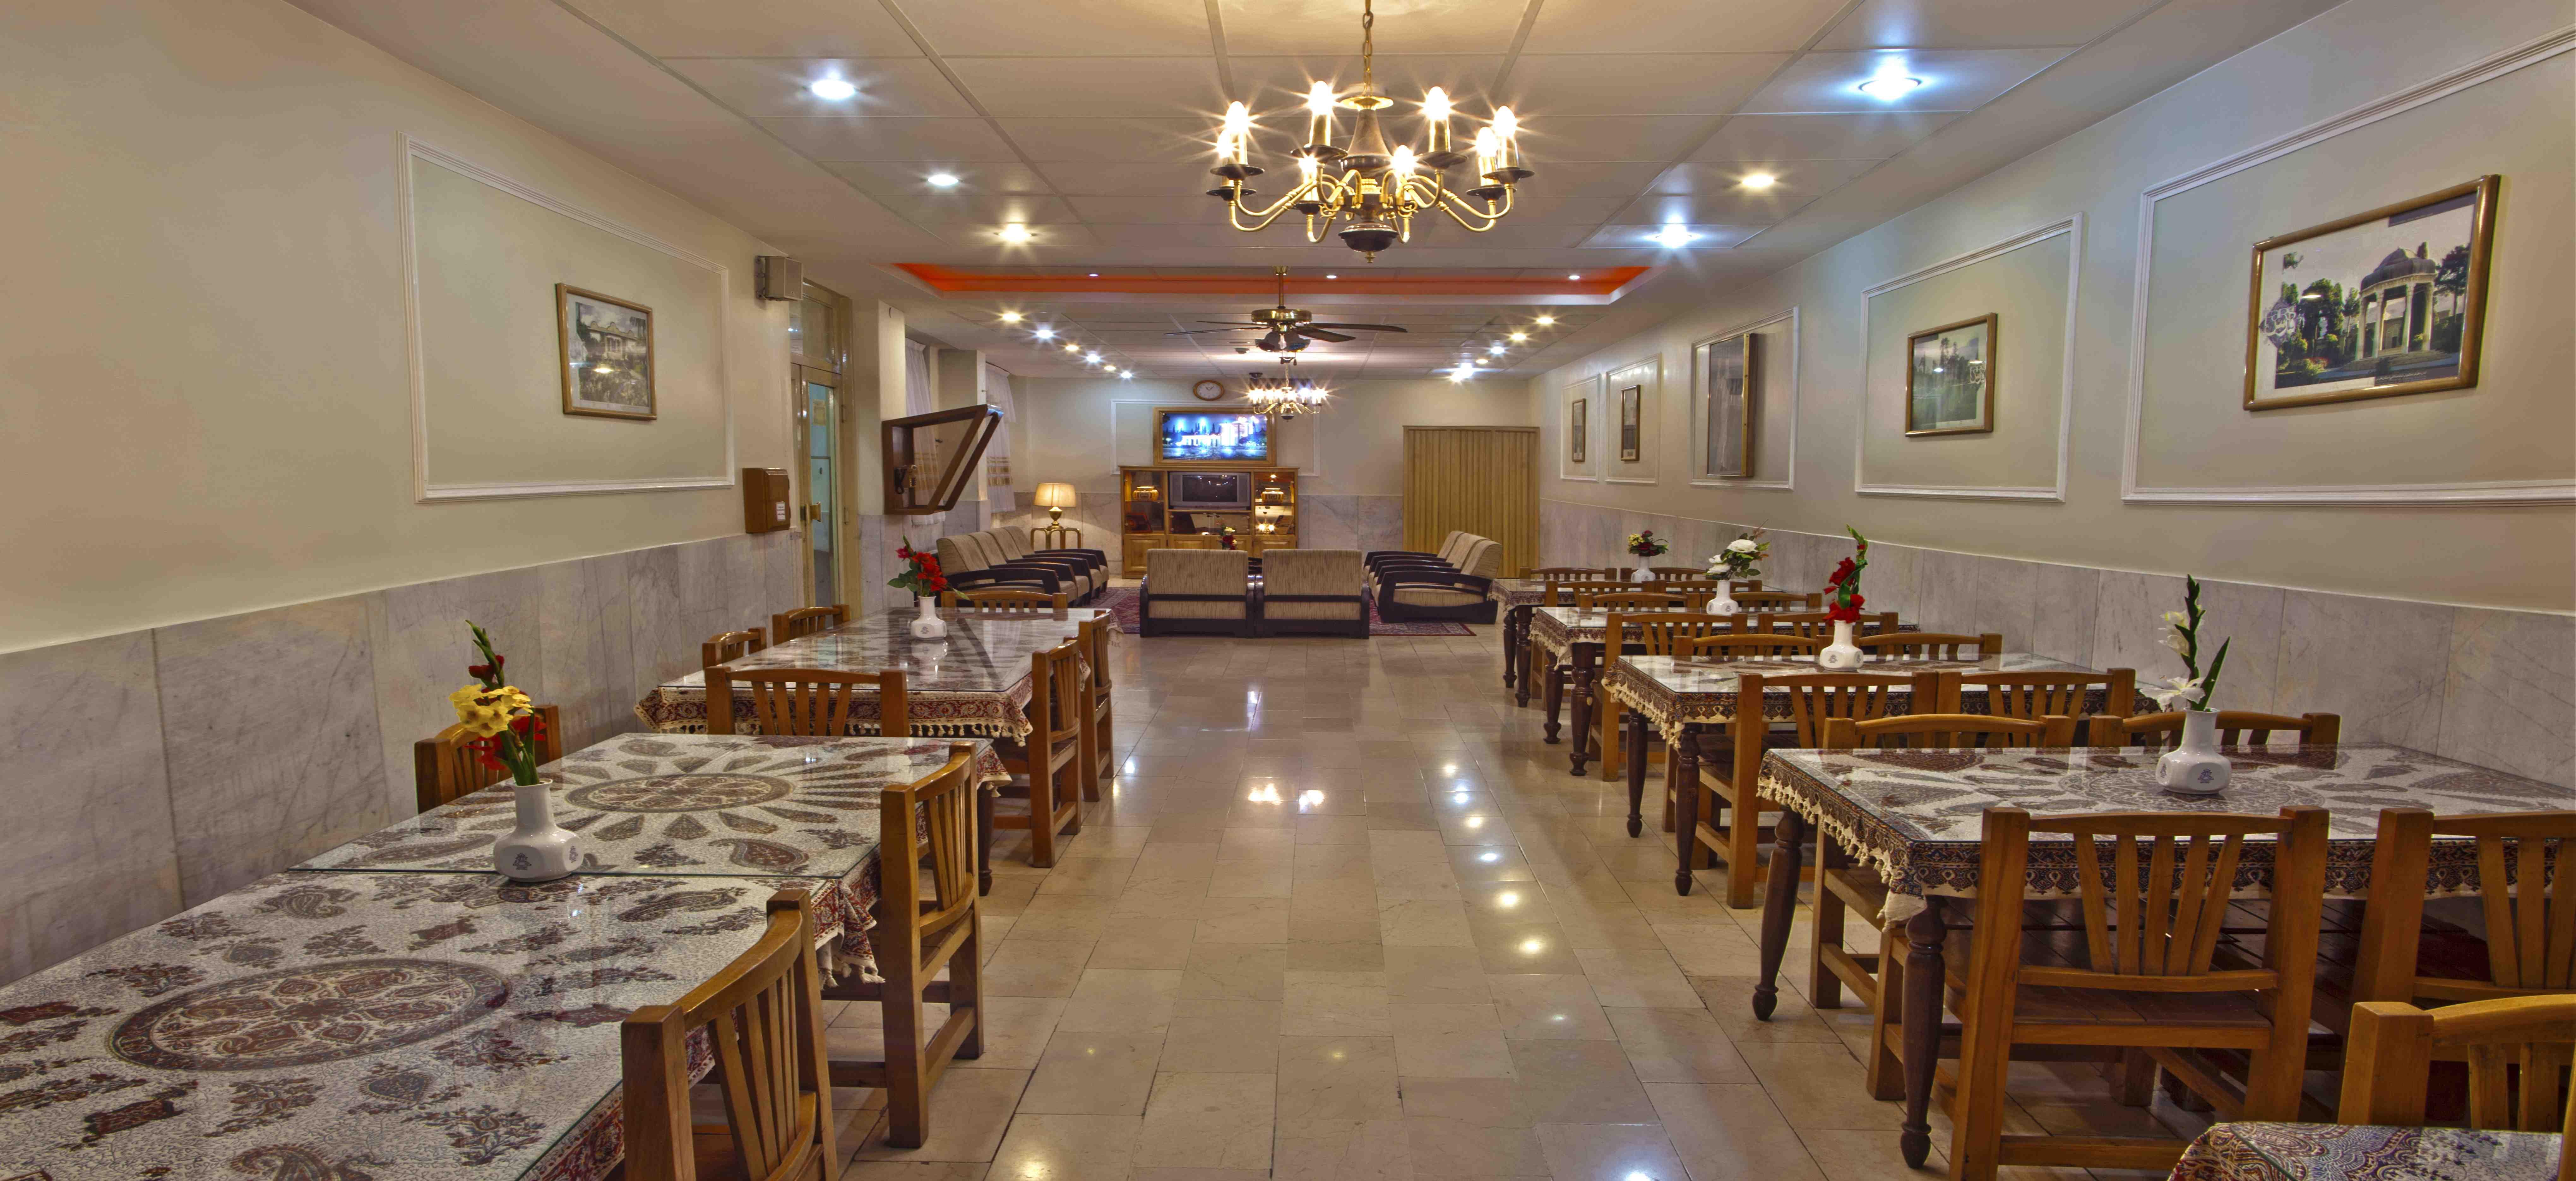 هتل ساسان شیراز10